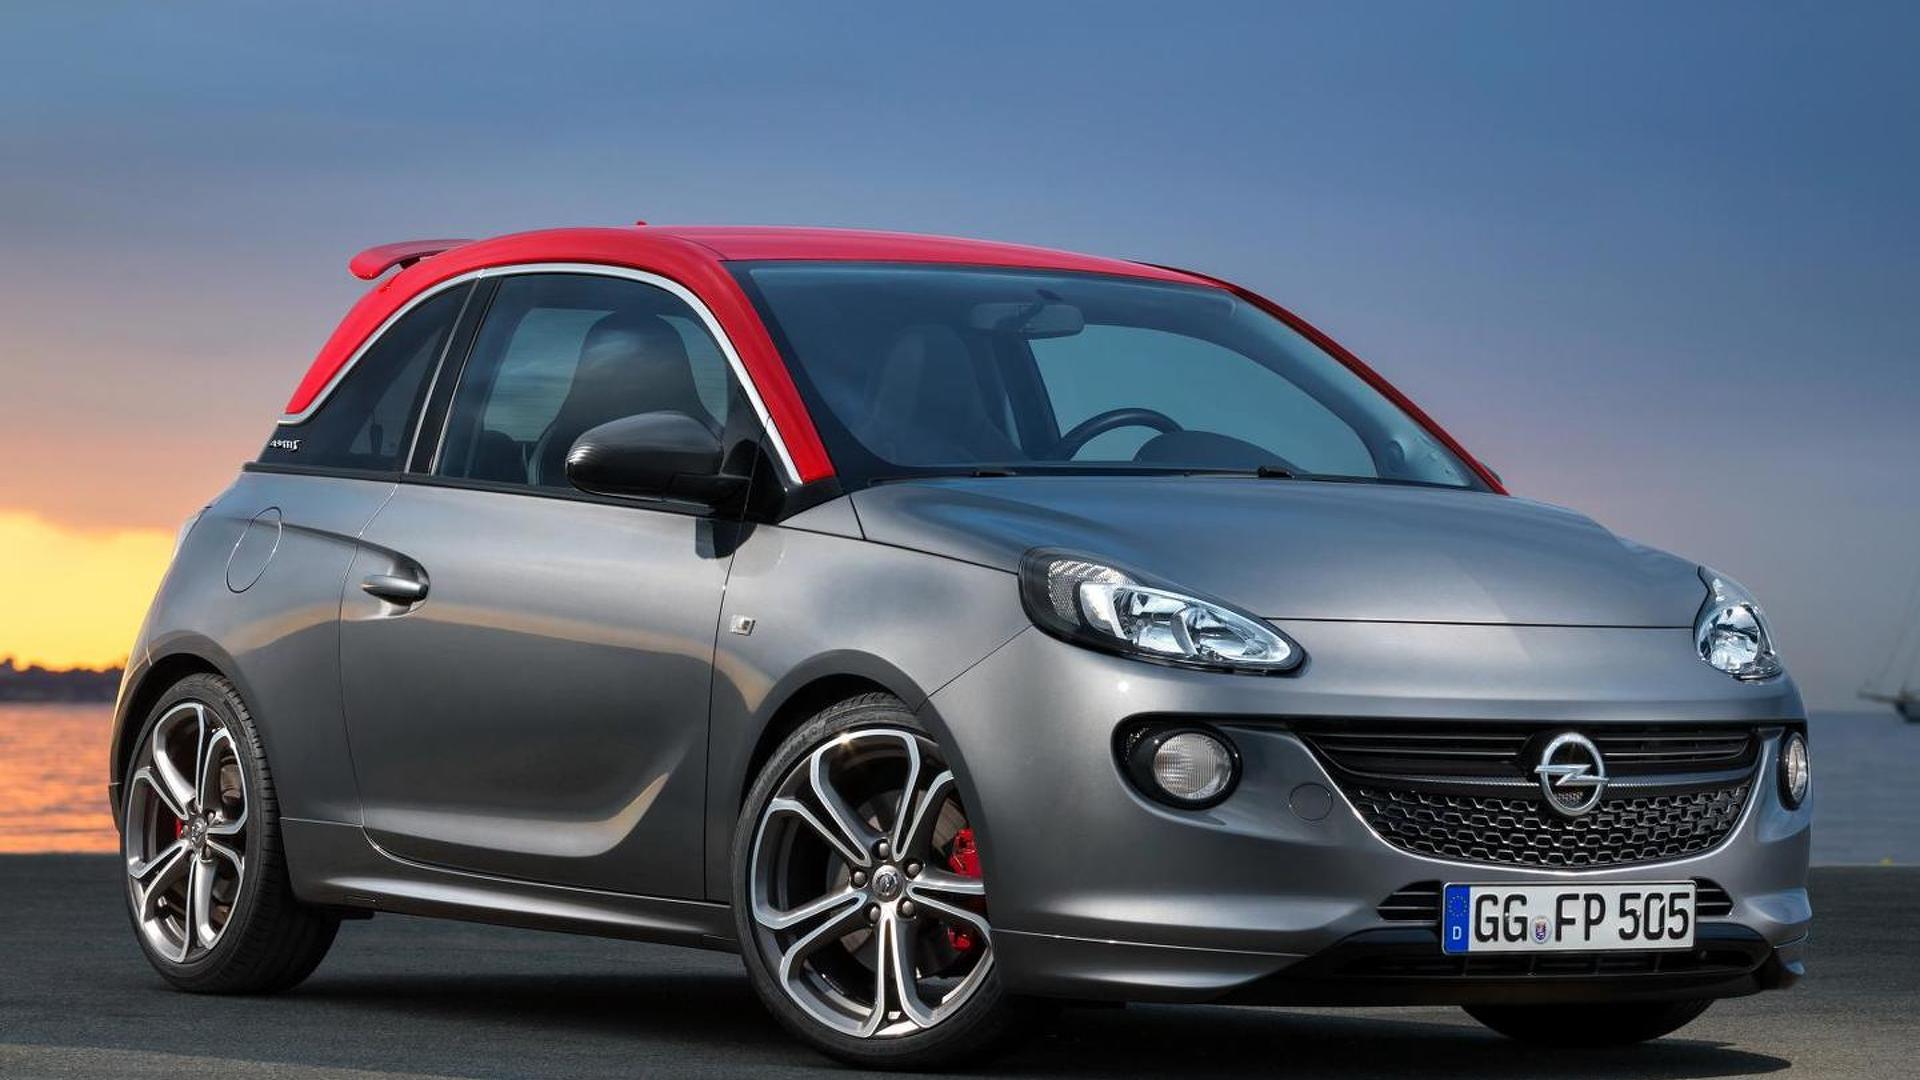 Production Opel Adam S revealed ahead of Paris Motor Show debut